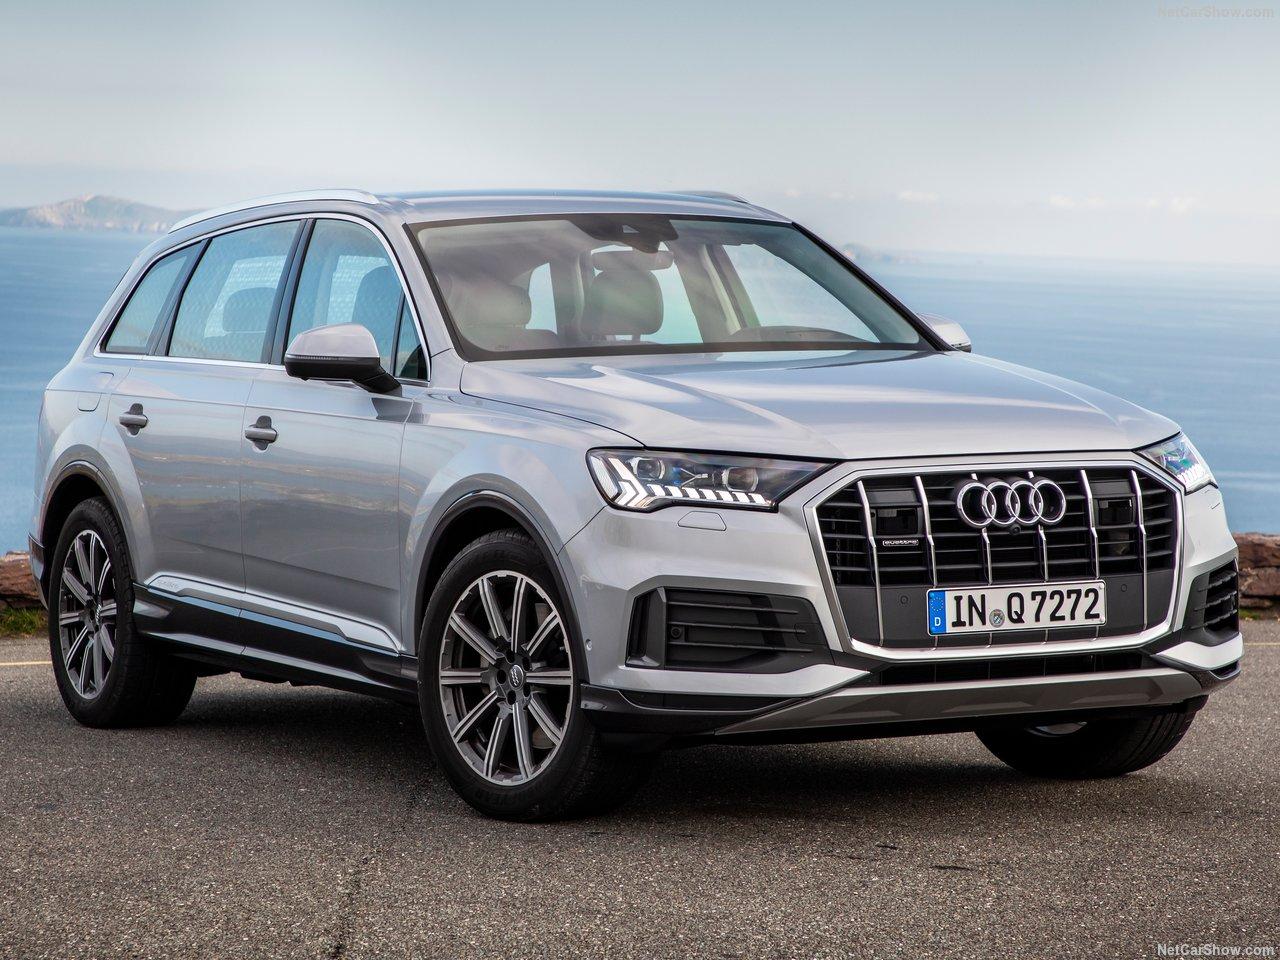 Audi-Q7-2020-1280-02.jpg